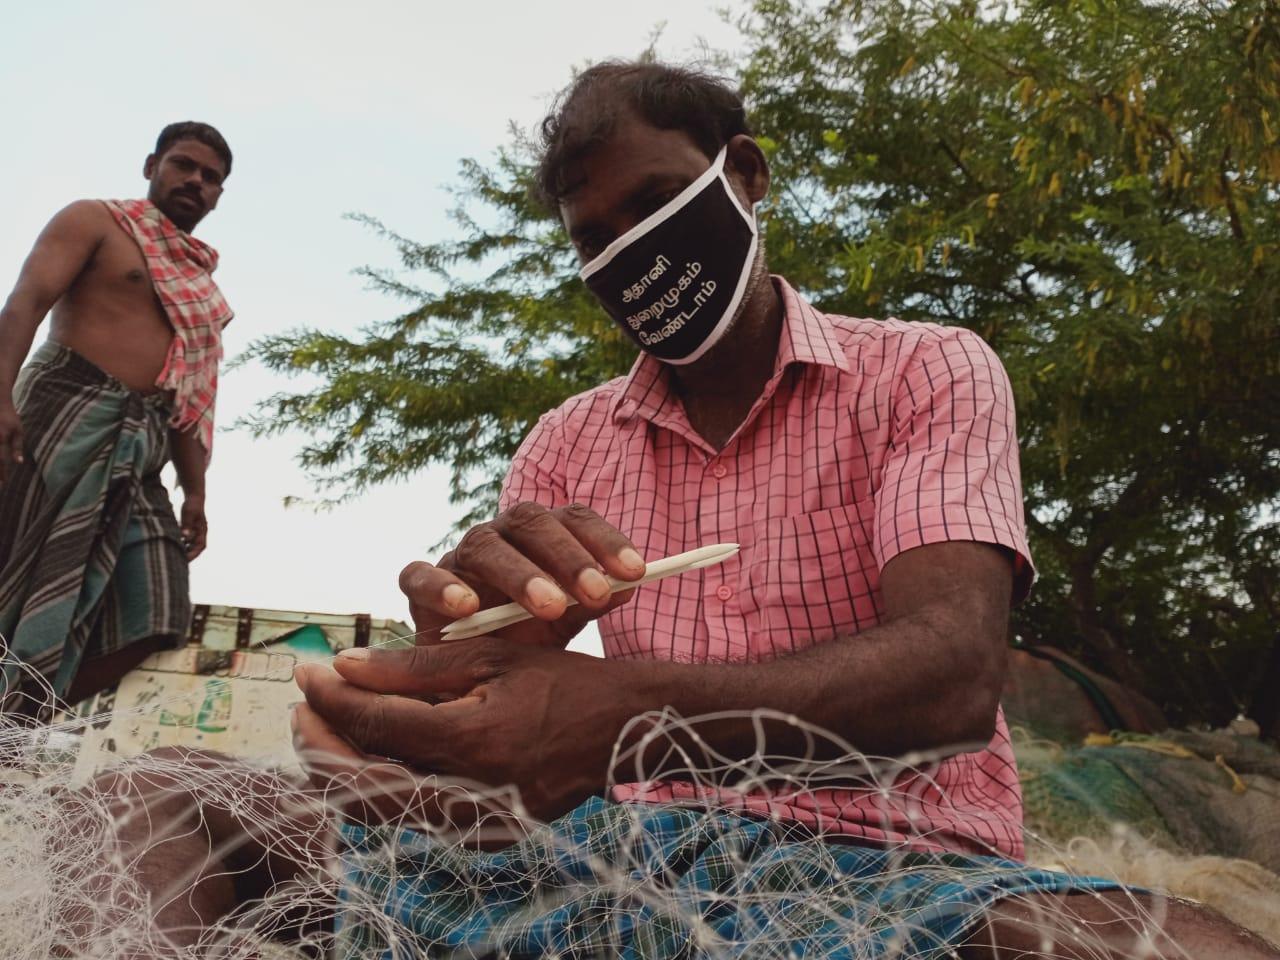 Fishers prepare their nets at Lake Pulicat, threatened by Adani Ports expansion. Image courtesy K. Saravanan, S. Palayam